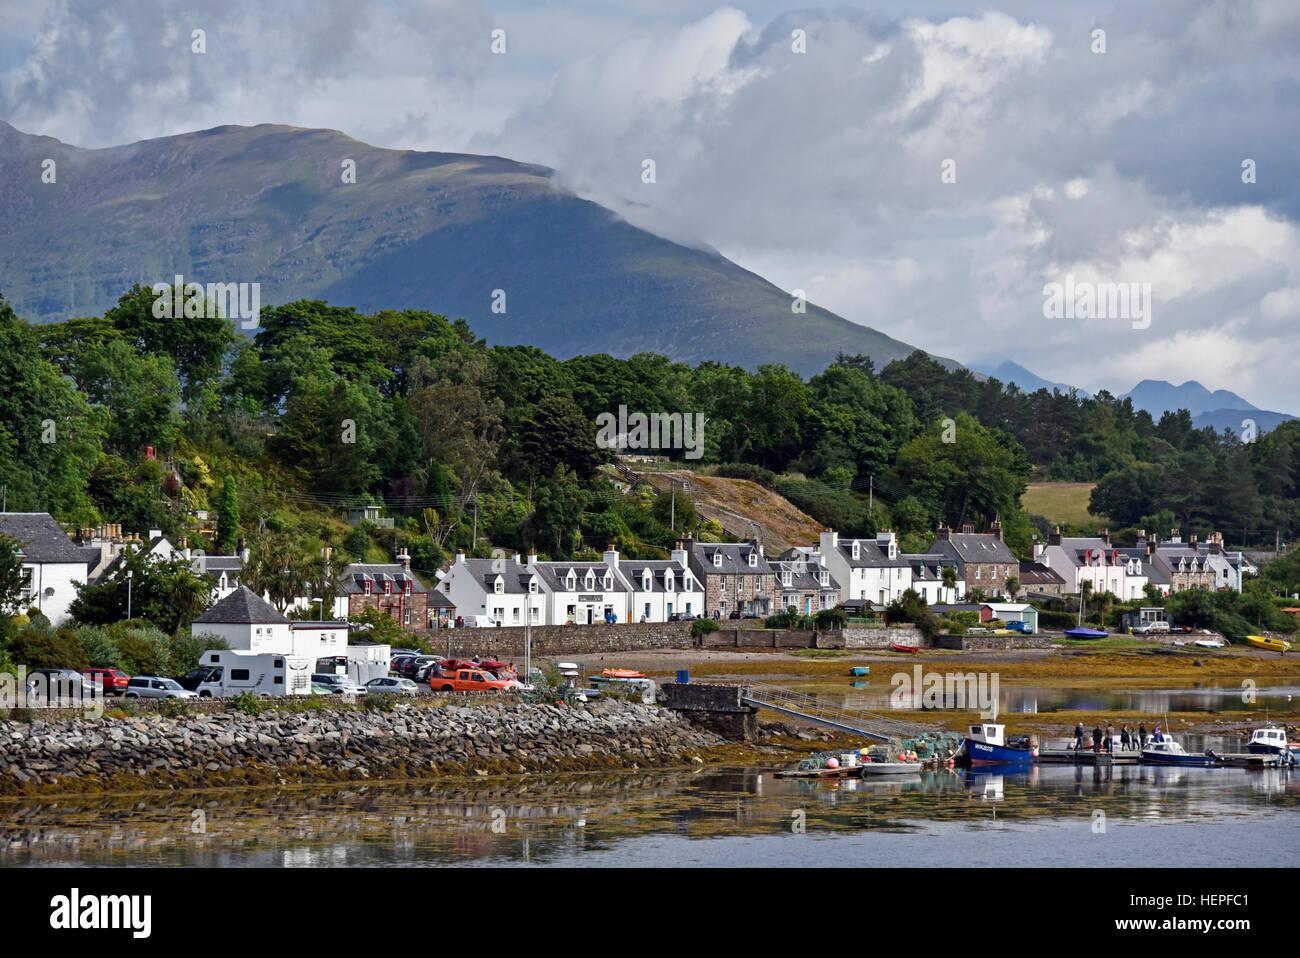 plockton-ross-and-cromarty-scotland-united-kingdom-europe-HEPFC1.jpg